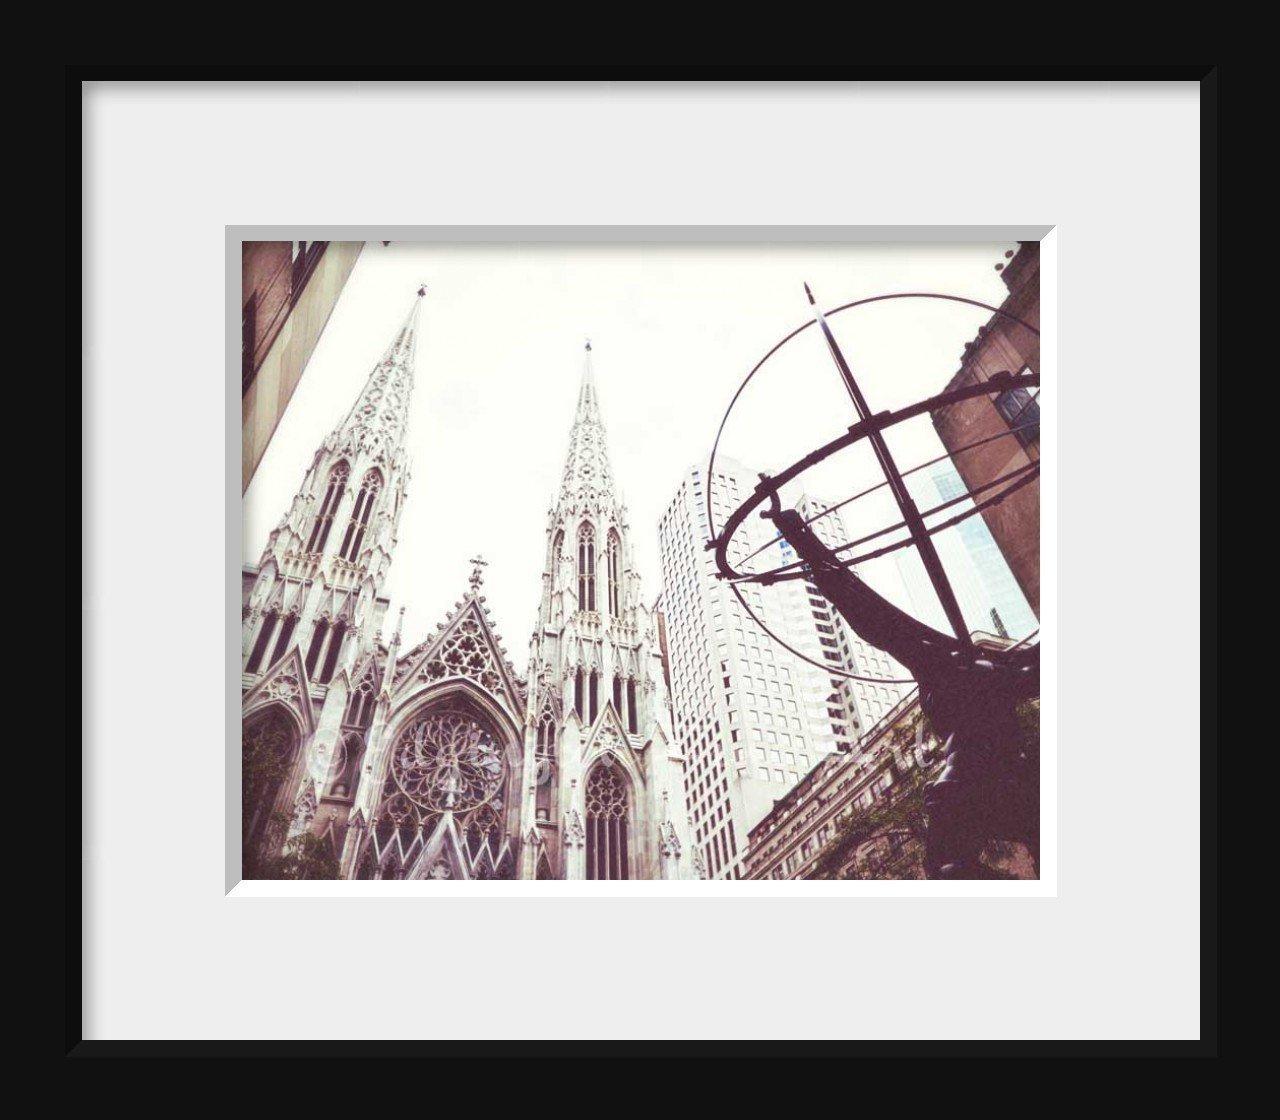 Set of 3 New York City Scenes urban decor 5x7 inch prints by Audra Edgington Fine Art